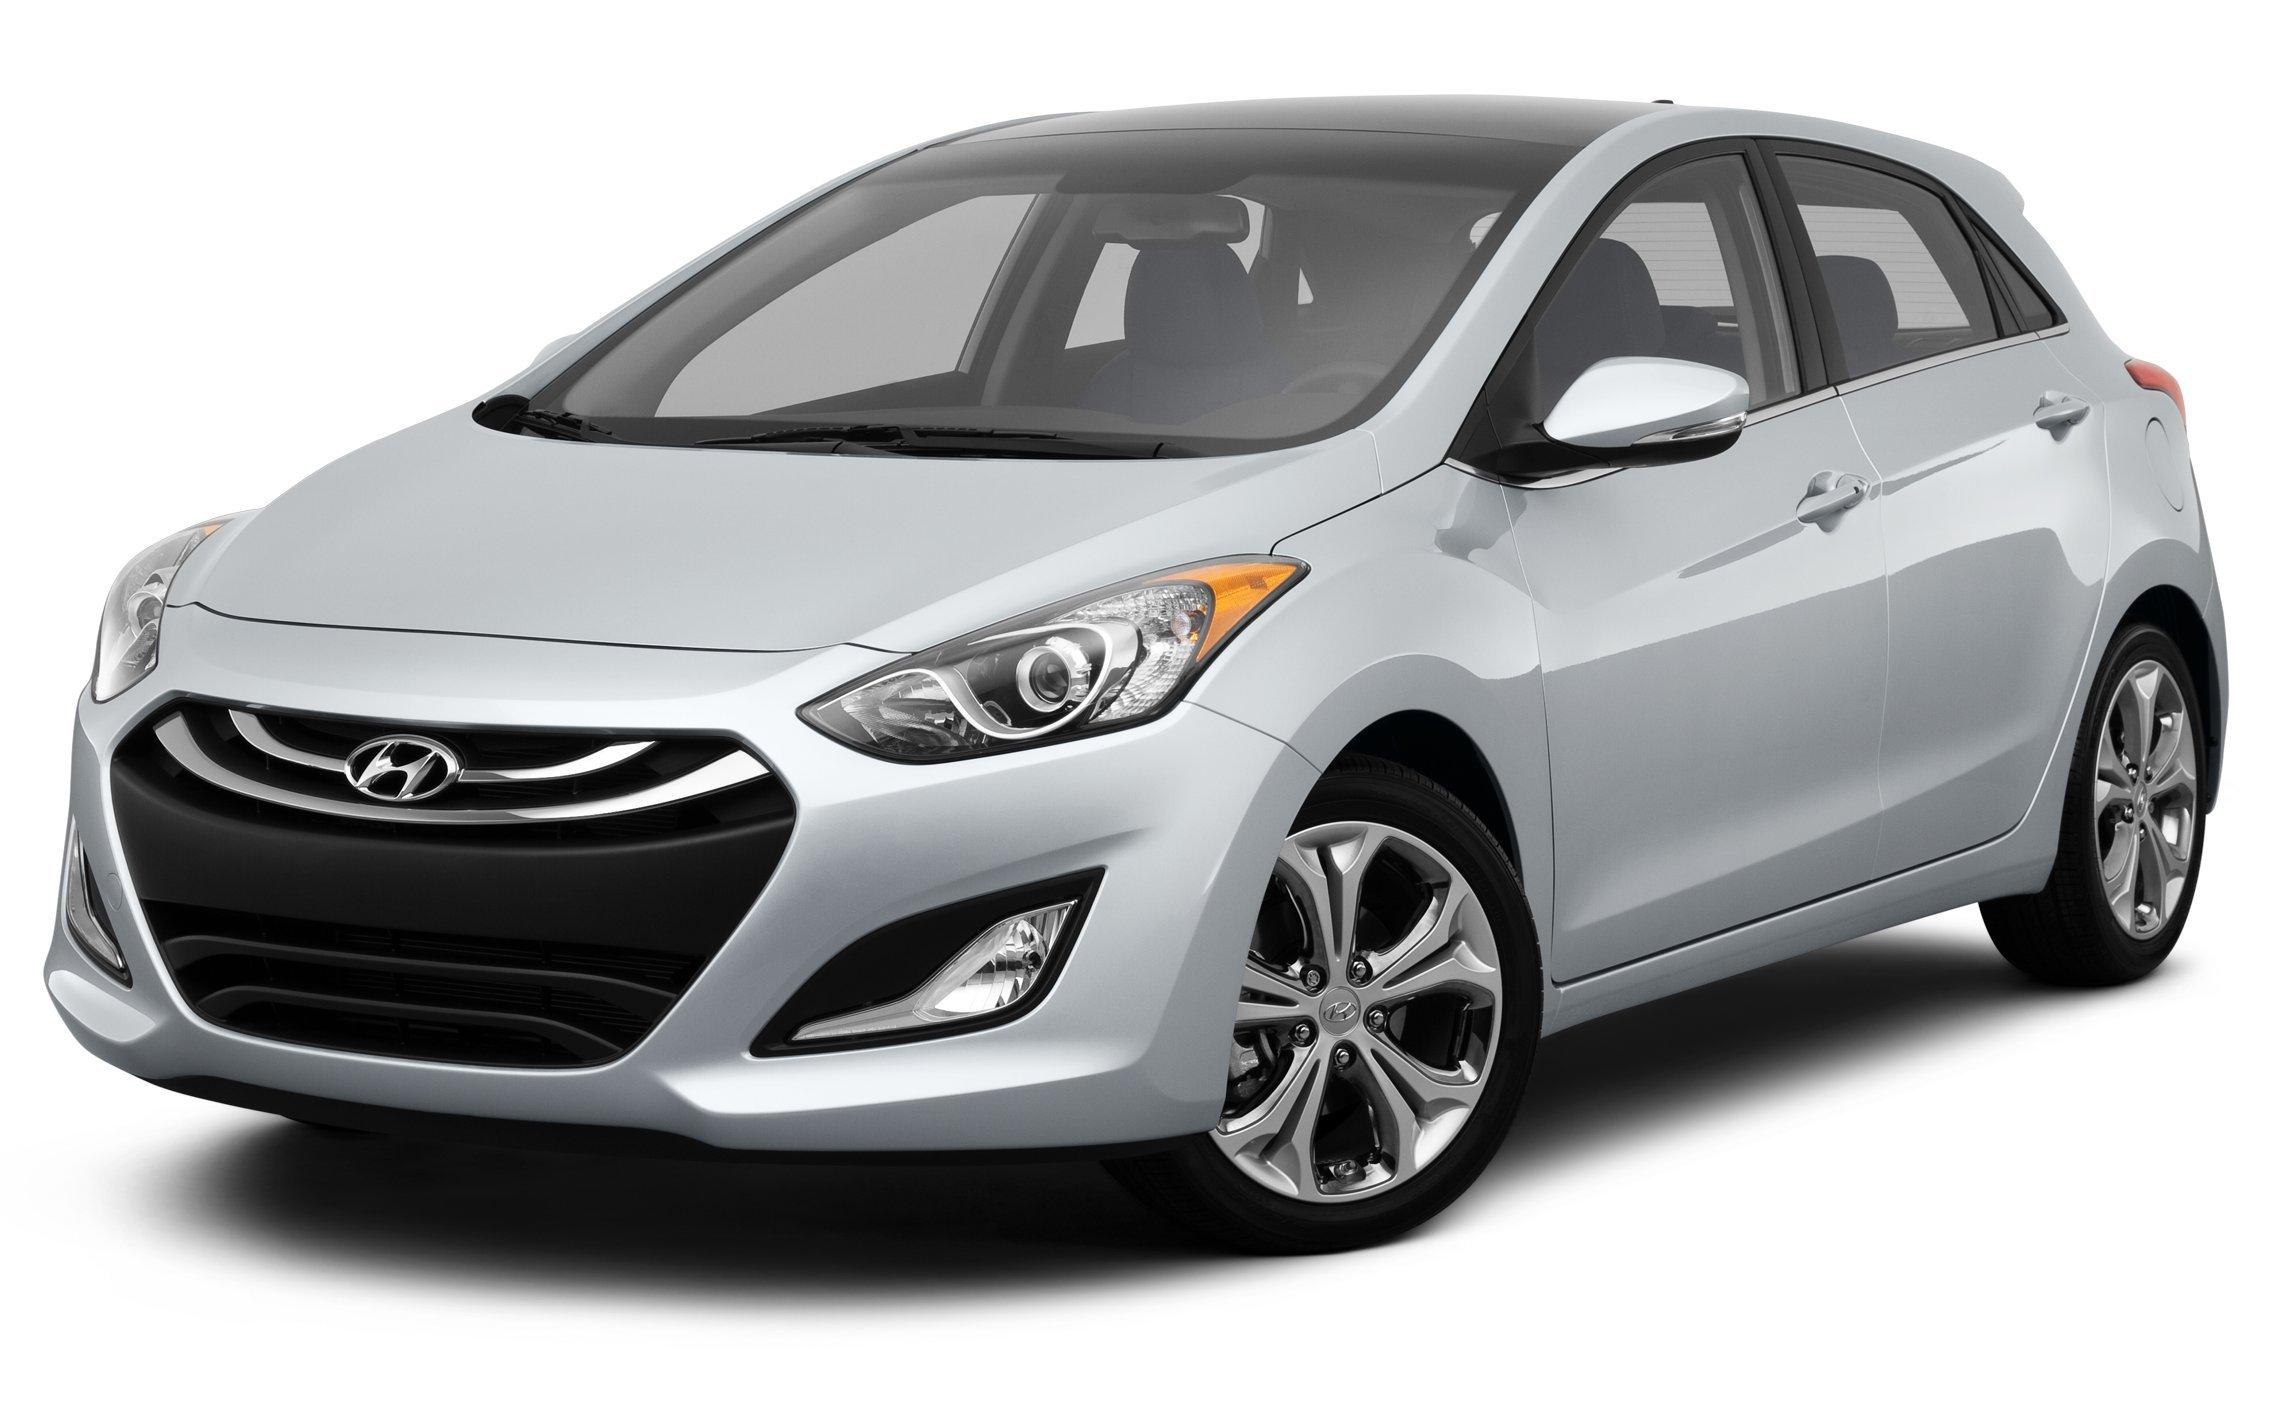 Amazon 2013 Hyundai Elantra GT Reviews and Specs Vehicles